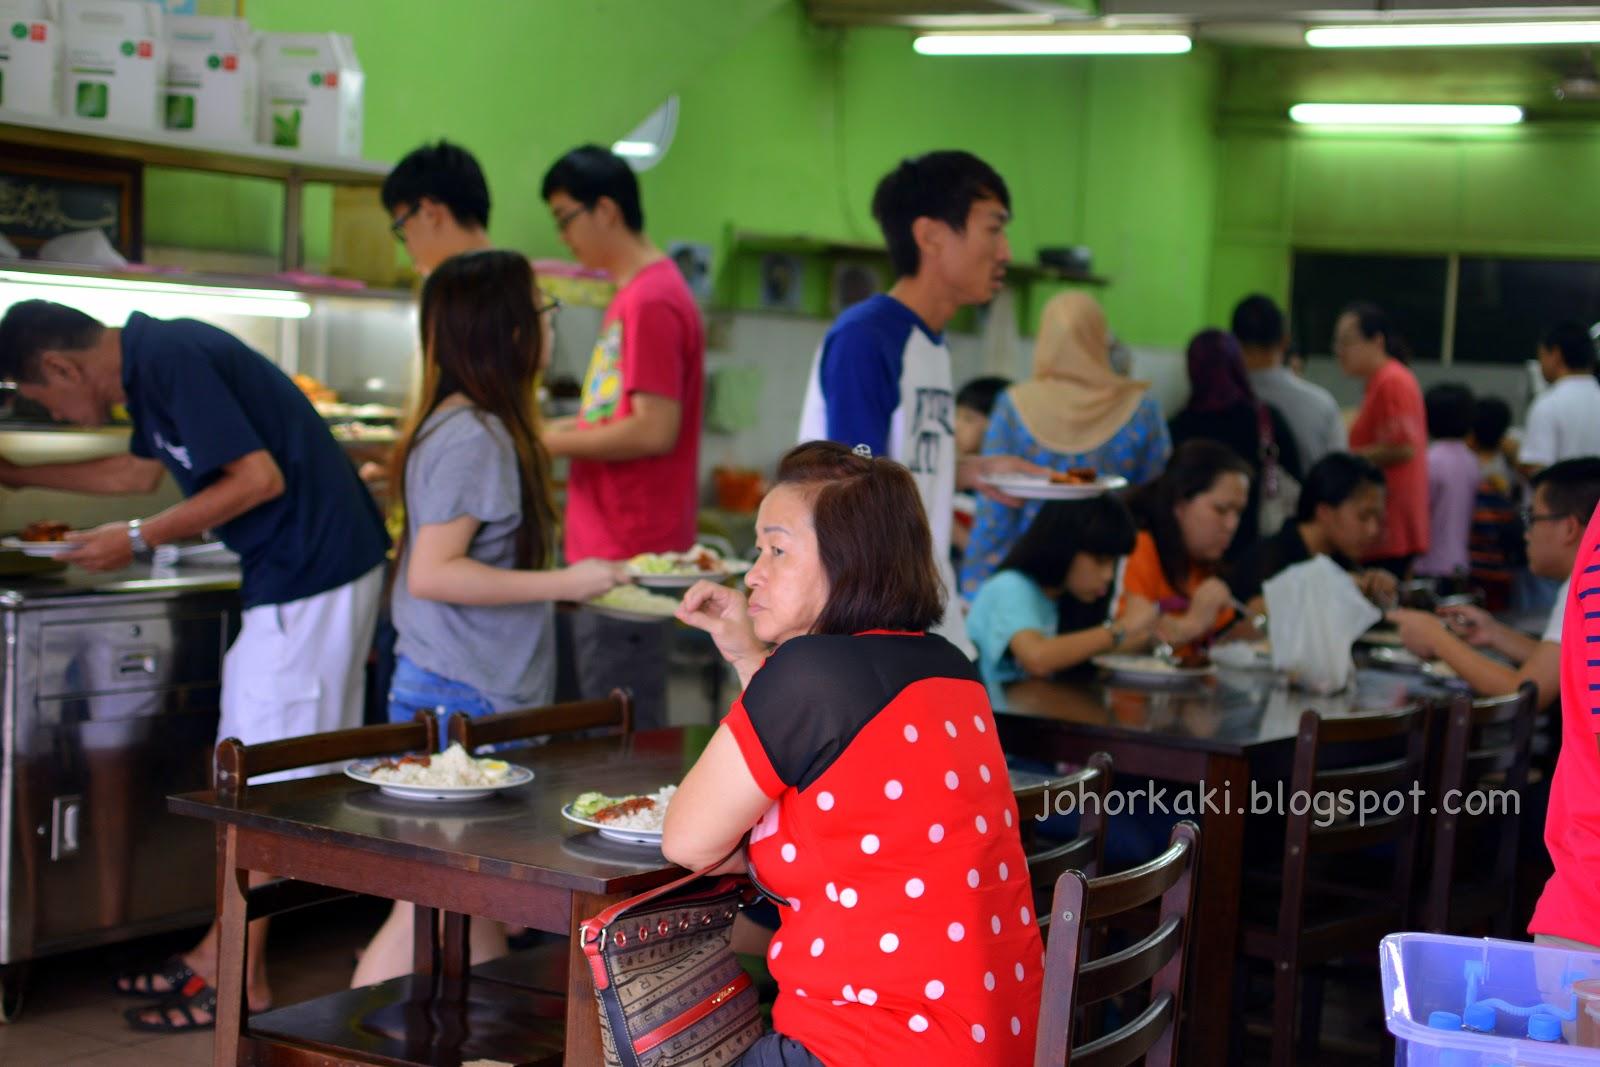 Dining Table Johor Bahru